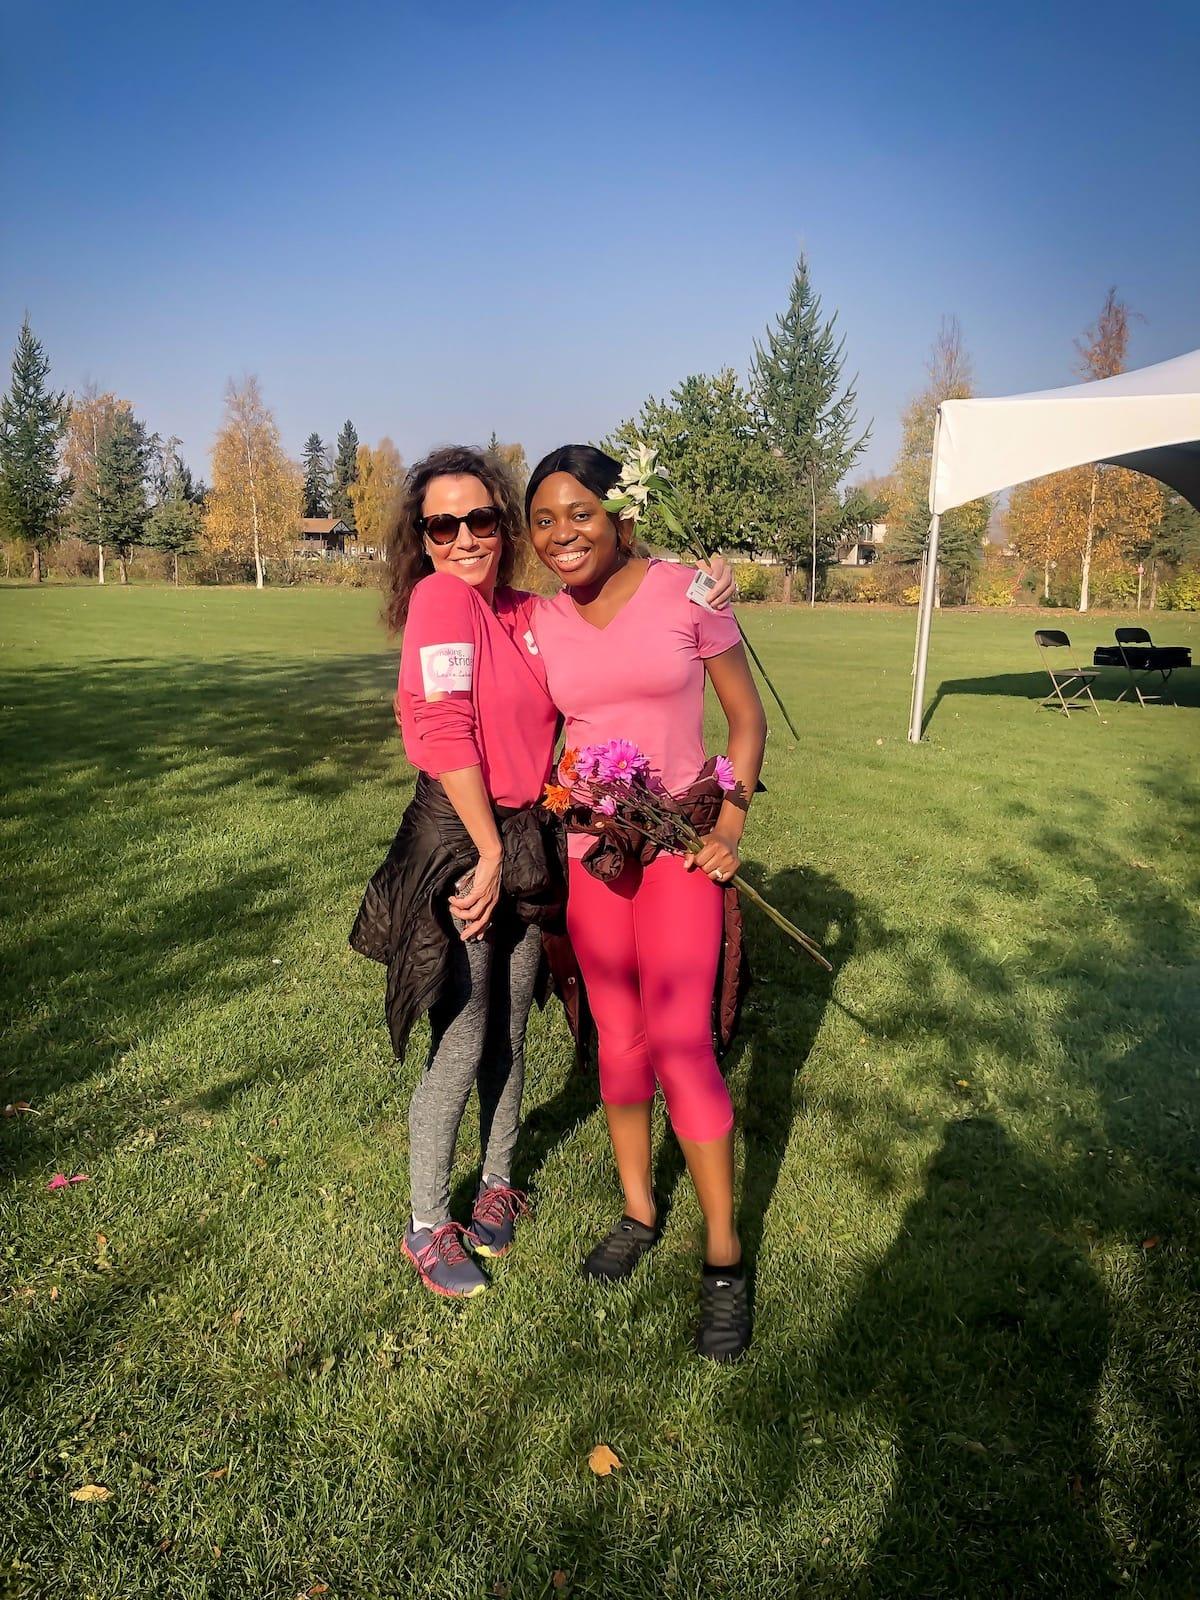 Making strides against breast cancer, 5K run in Fairbanks, Alaska